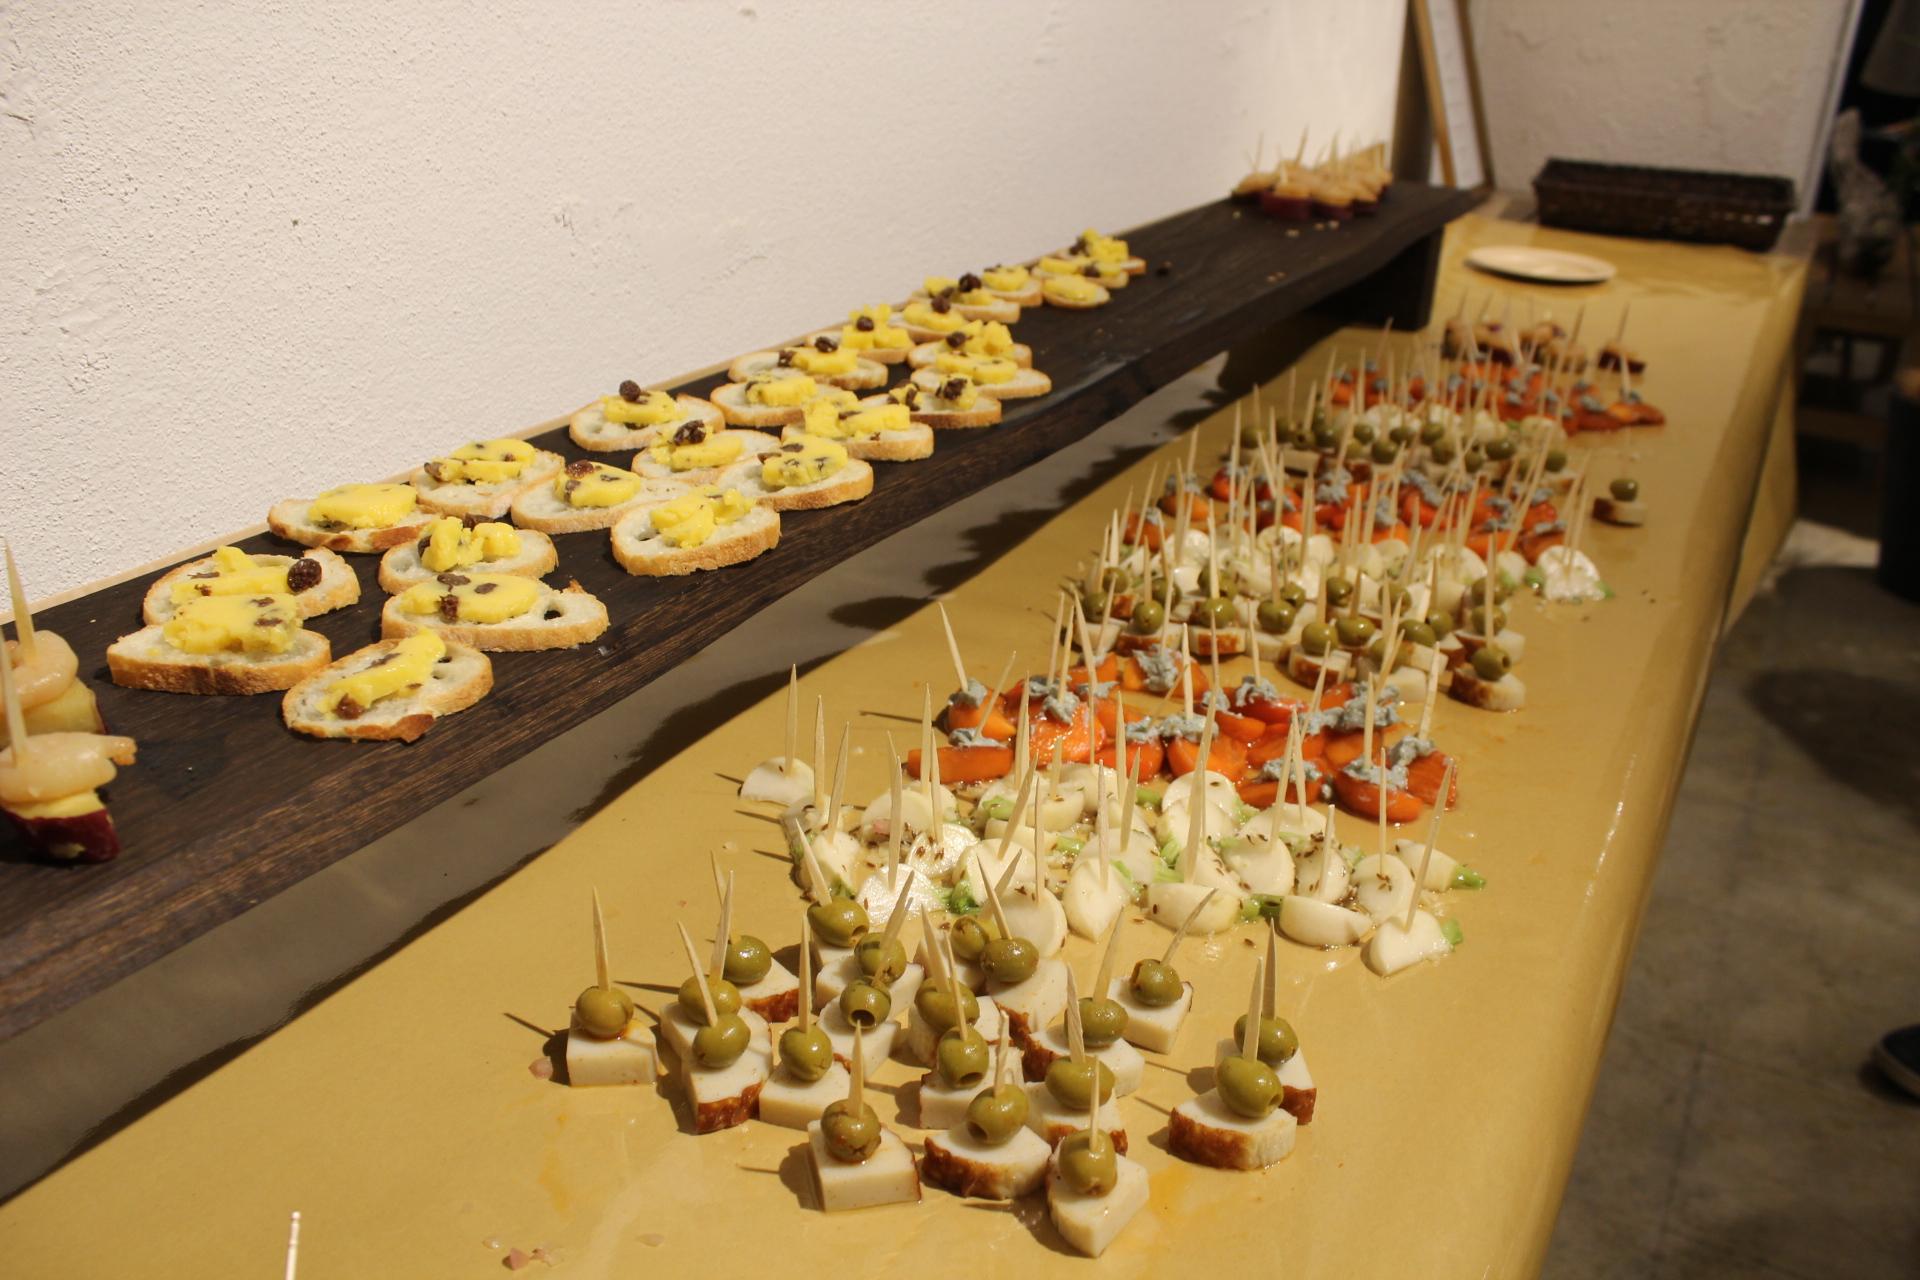 LIGの飲食事業部が提供しているピンチョスの写真